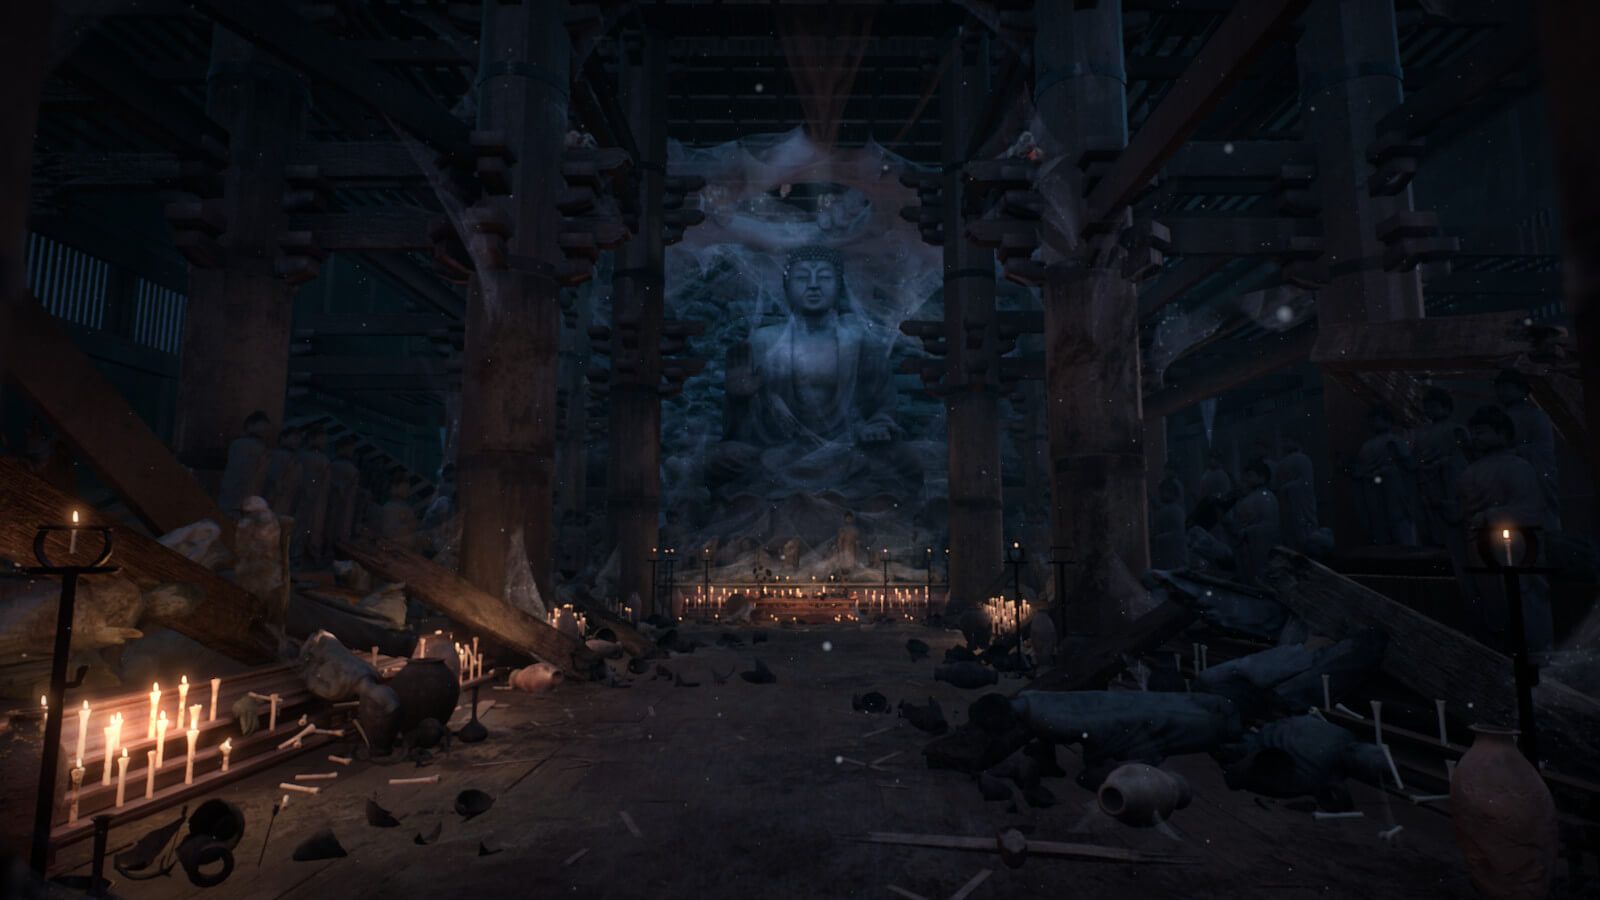 Crumbling temple interior